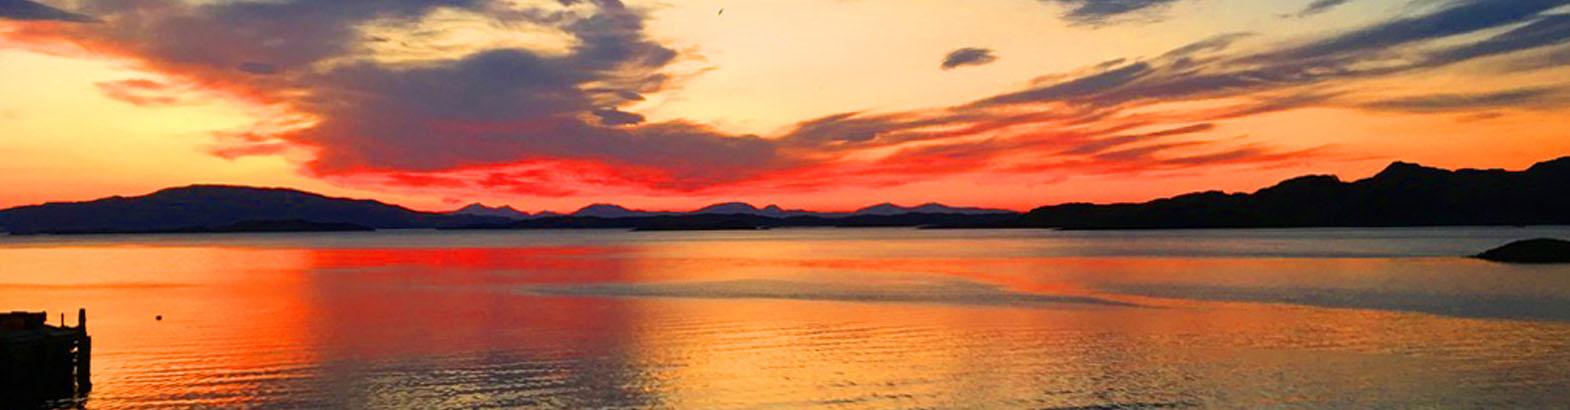 crinan sunset